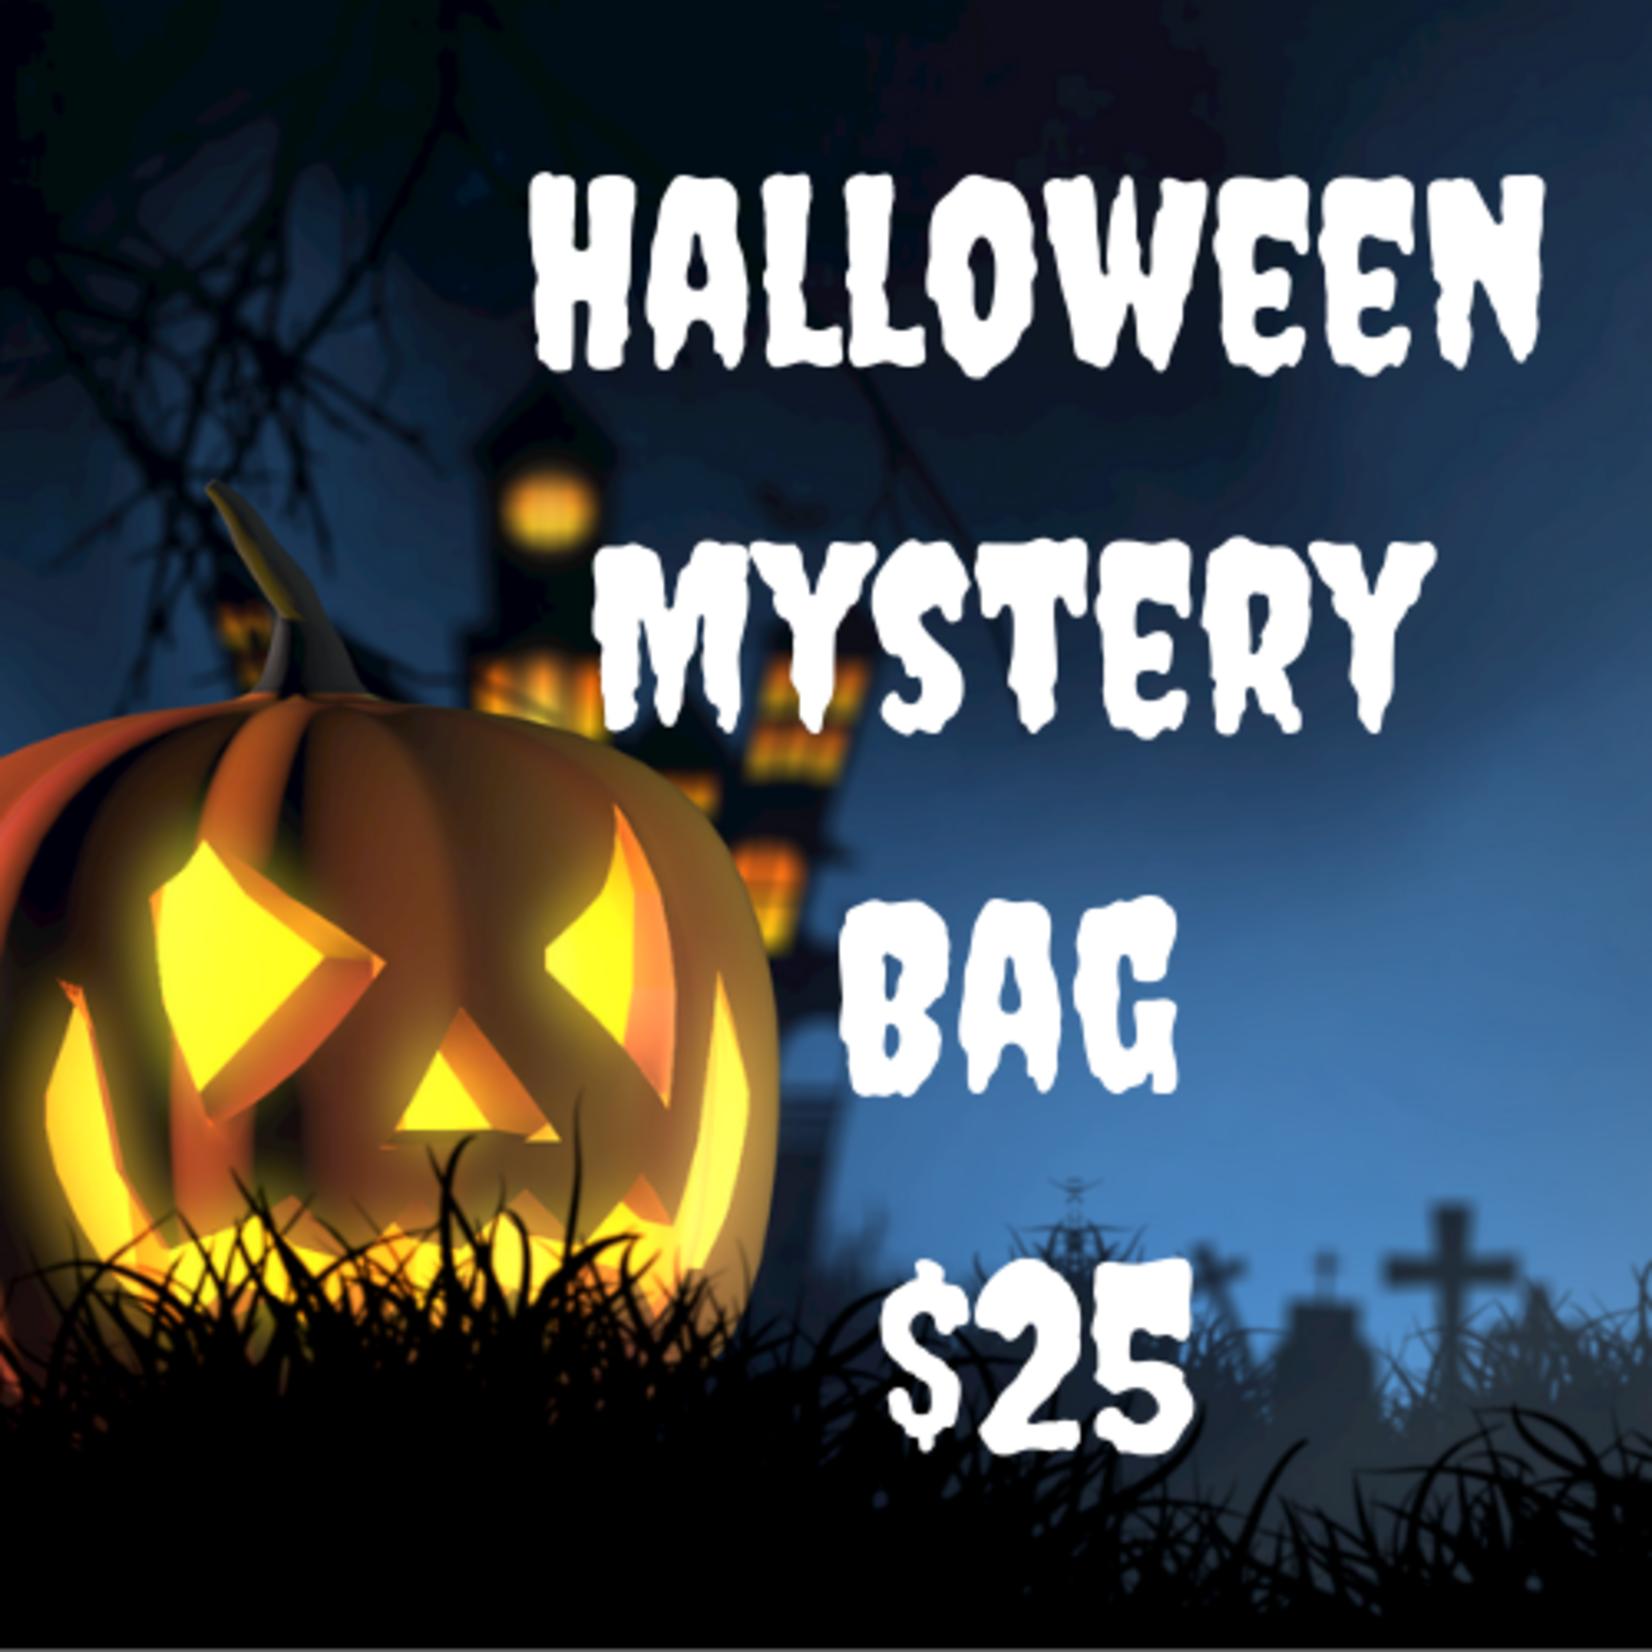 $25 Mystery Bag